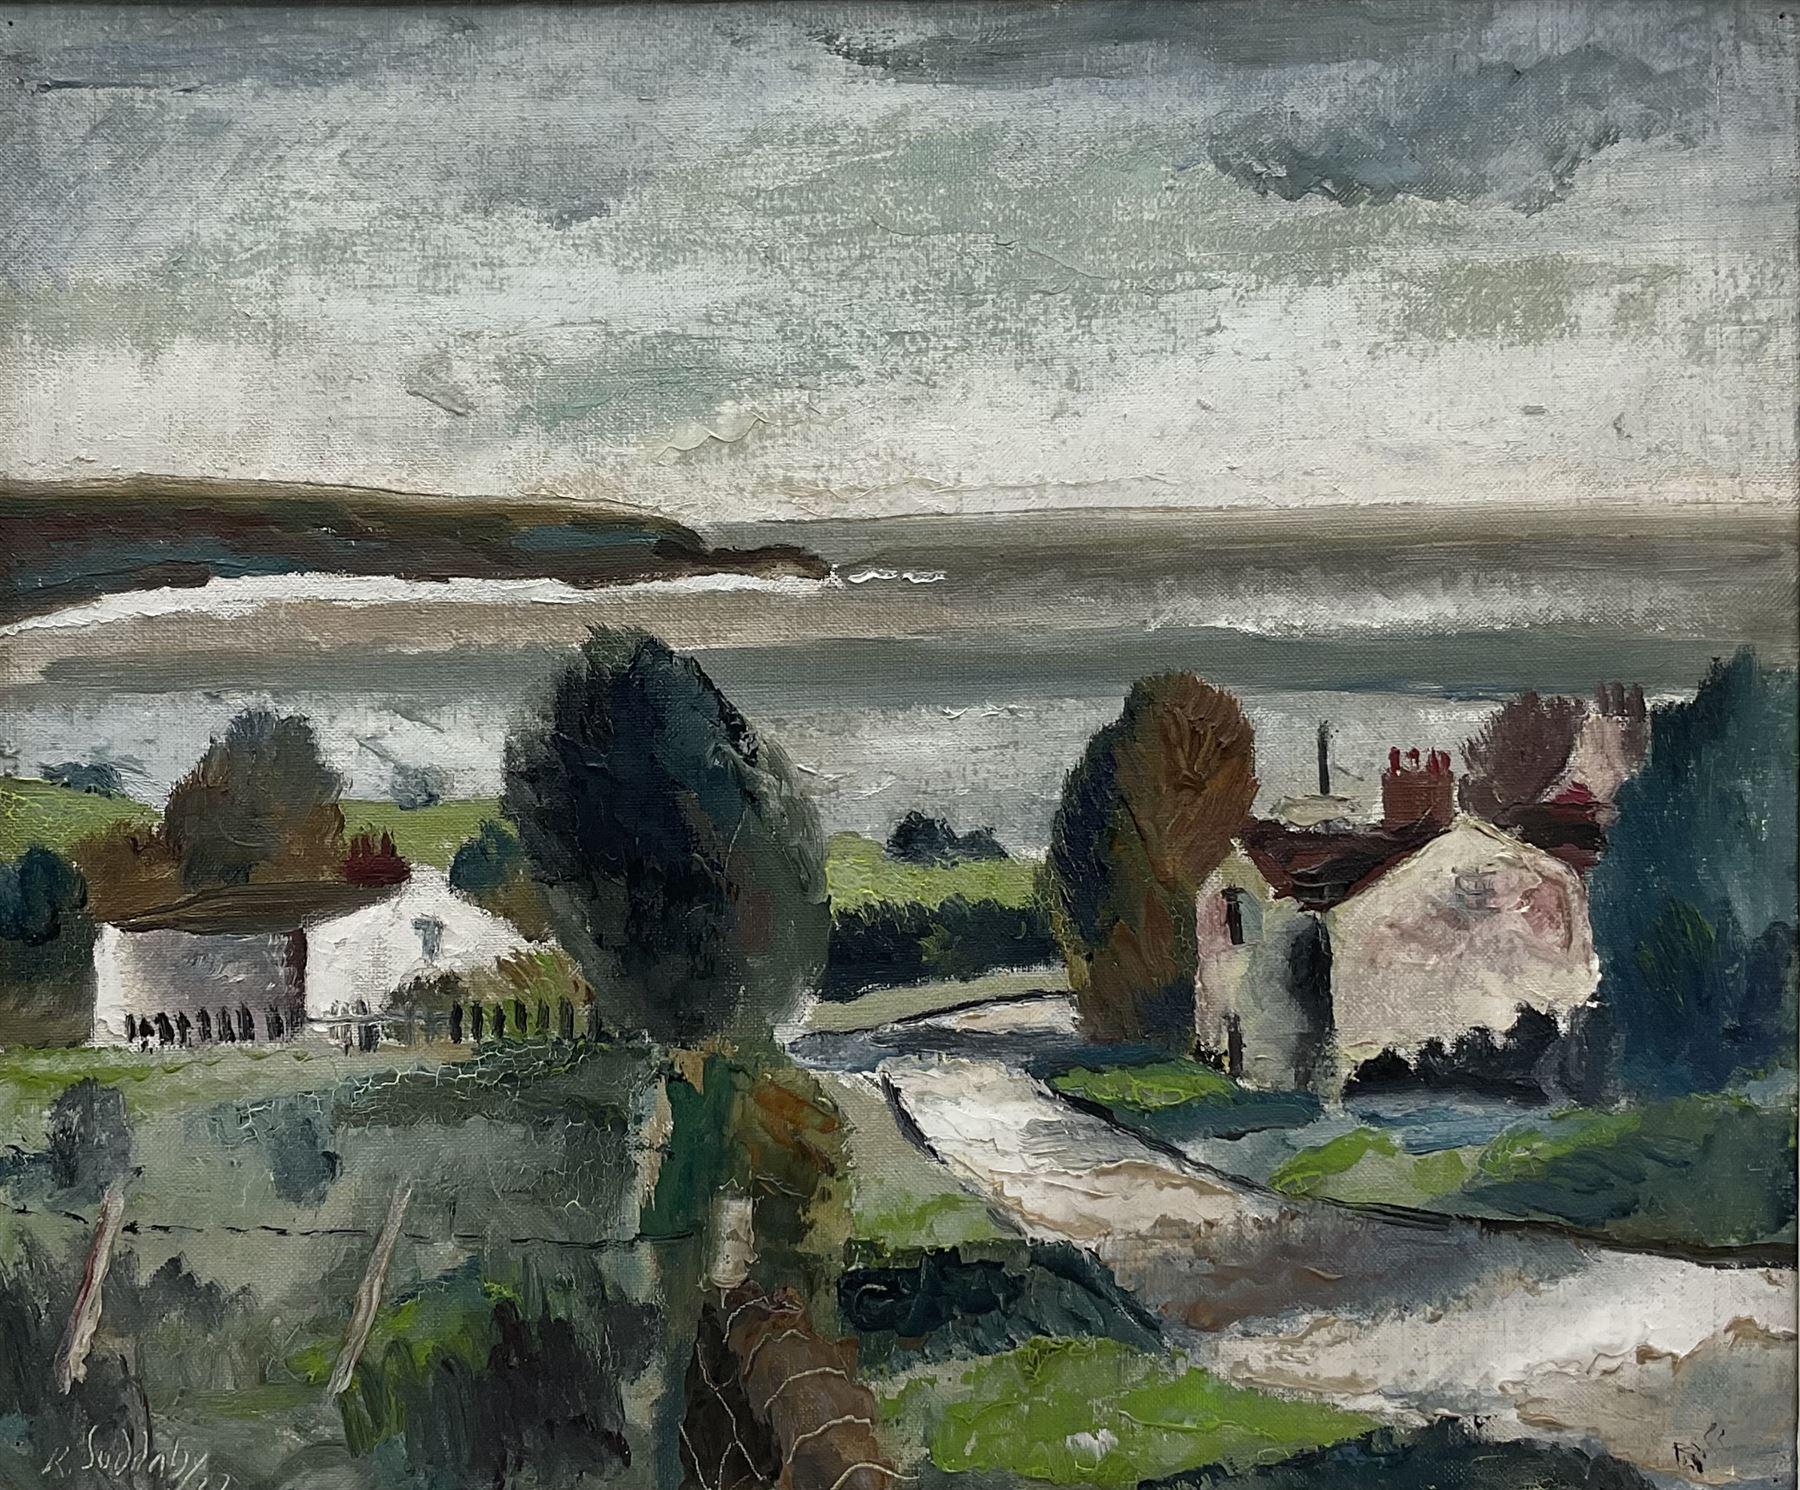 Rowland Suddaby (British 1912-1972): 'Coast near Whitby'